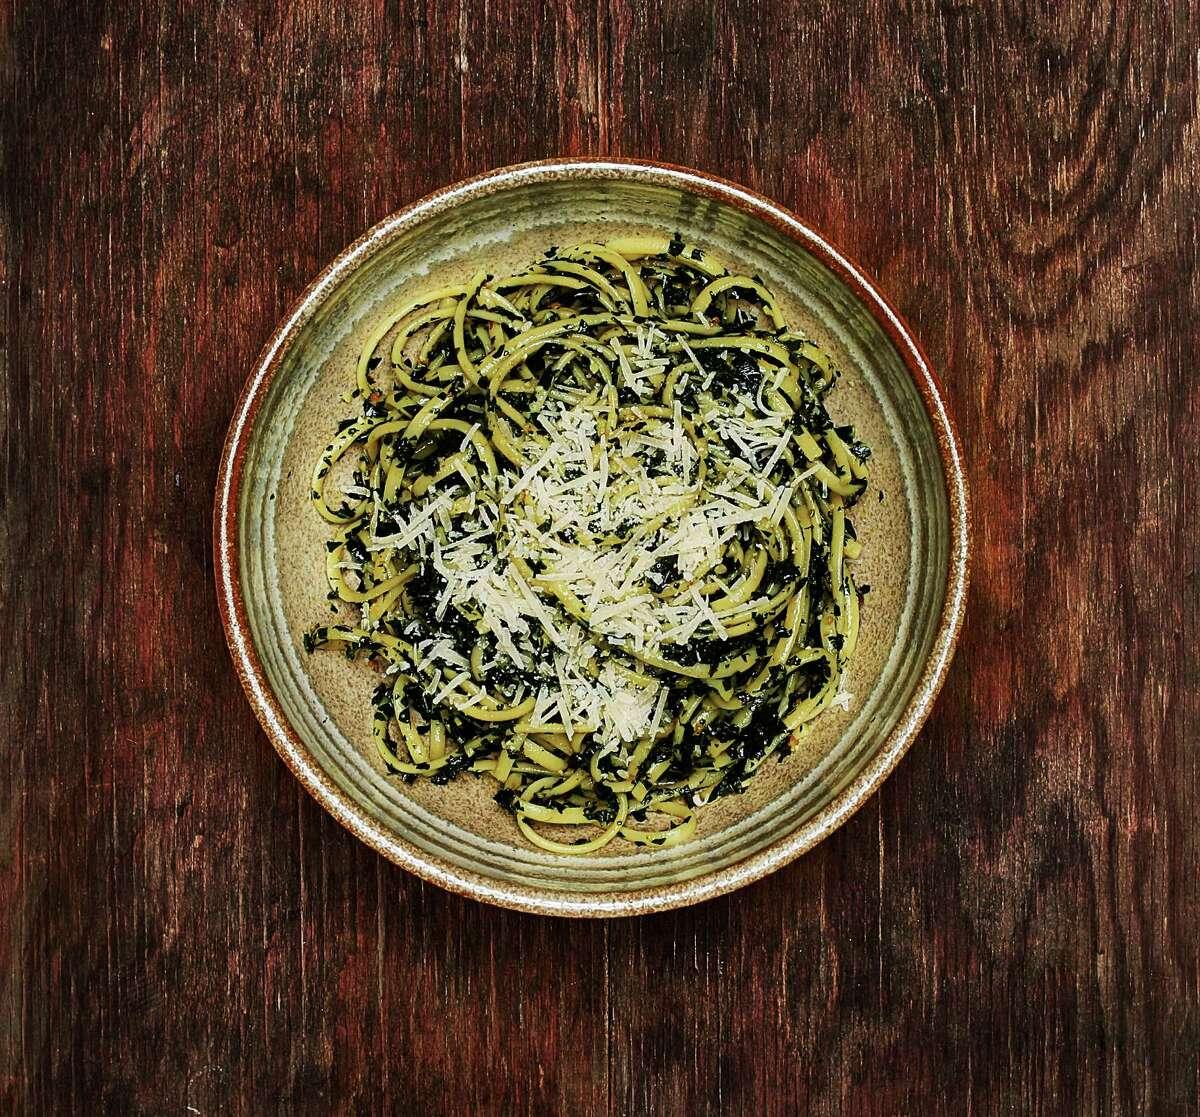 Pasta with Kale and Lemon Garlic Confit.